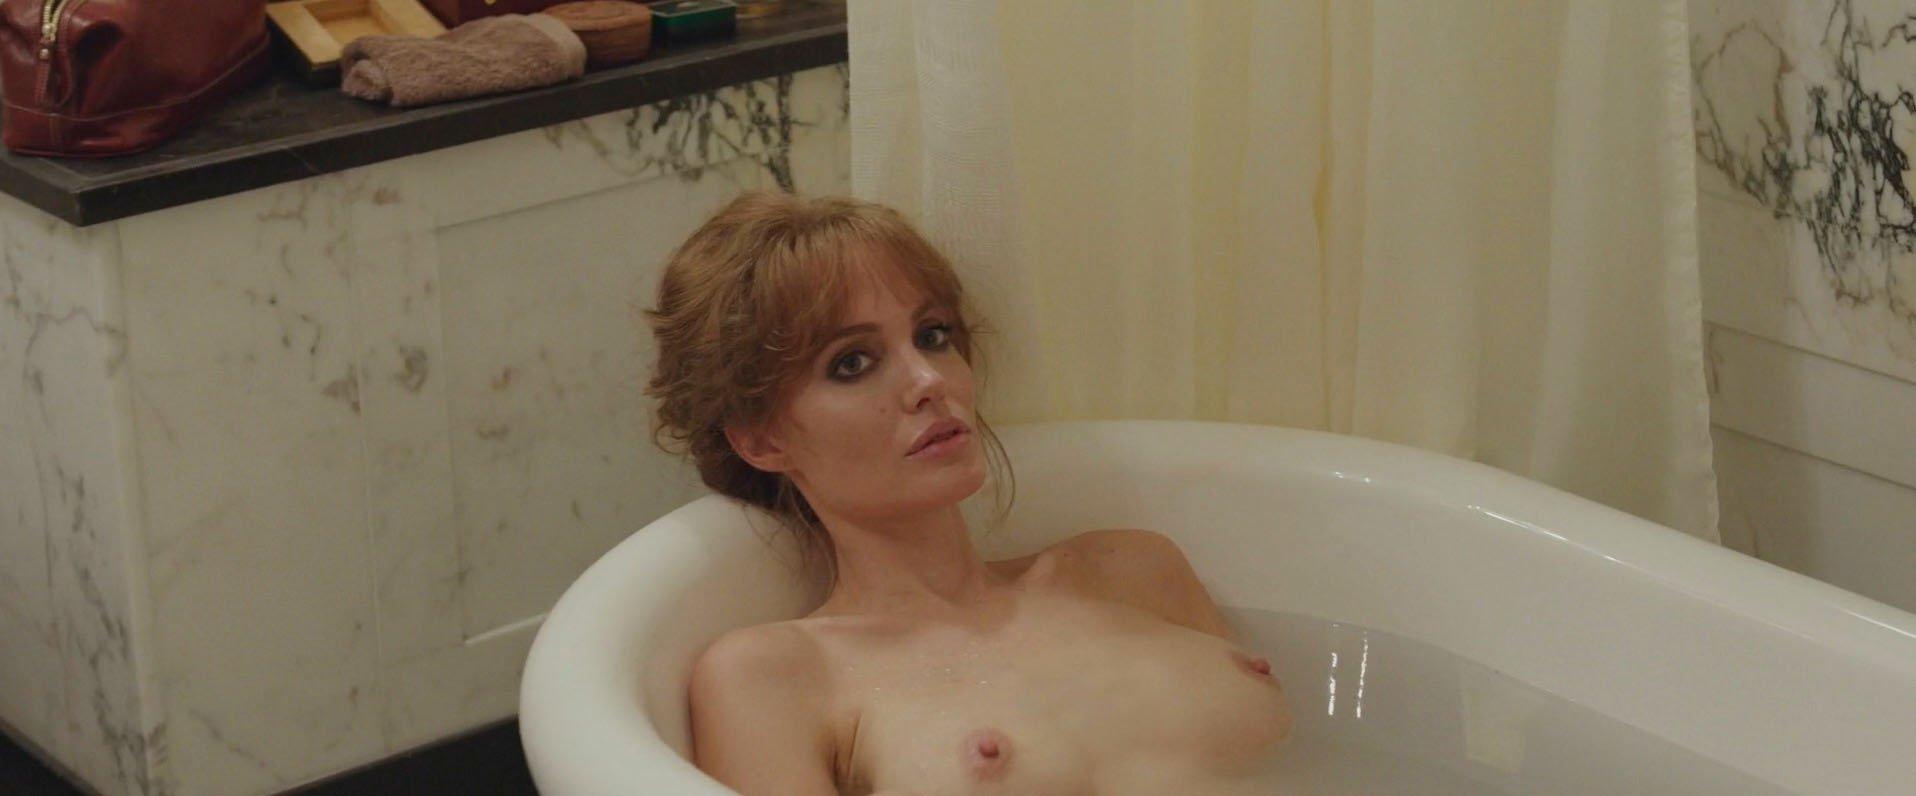 Angelina Jolienude angelina jolie boobs | #thefappening